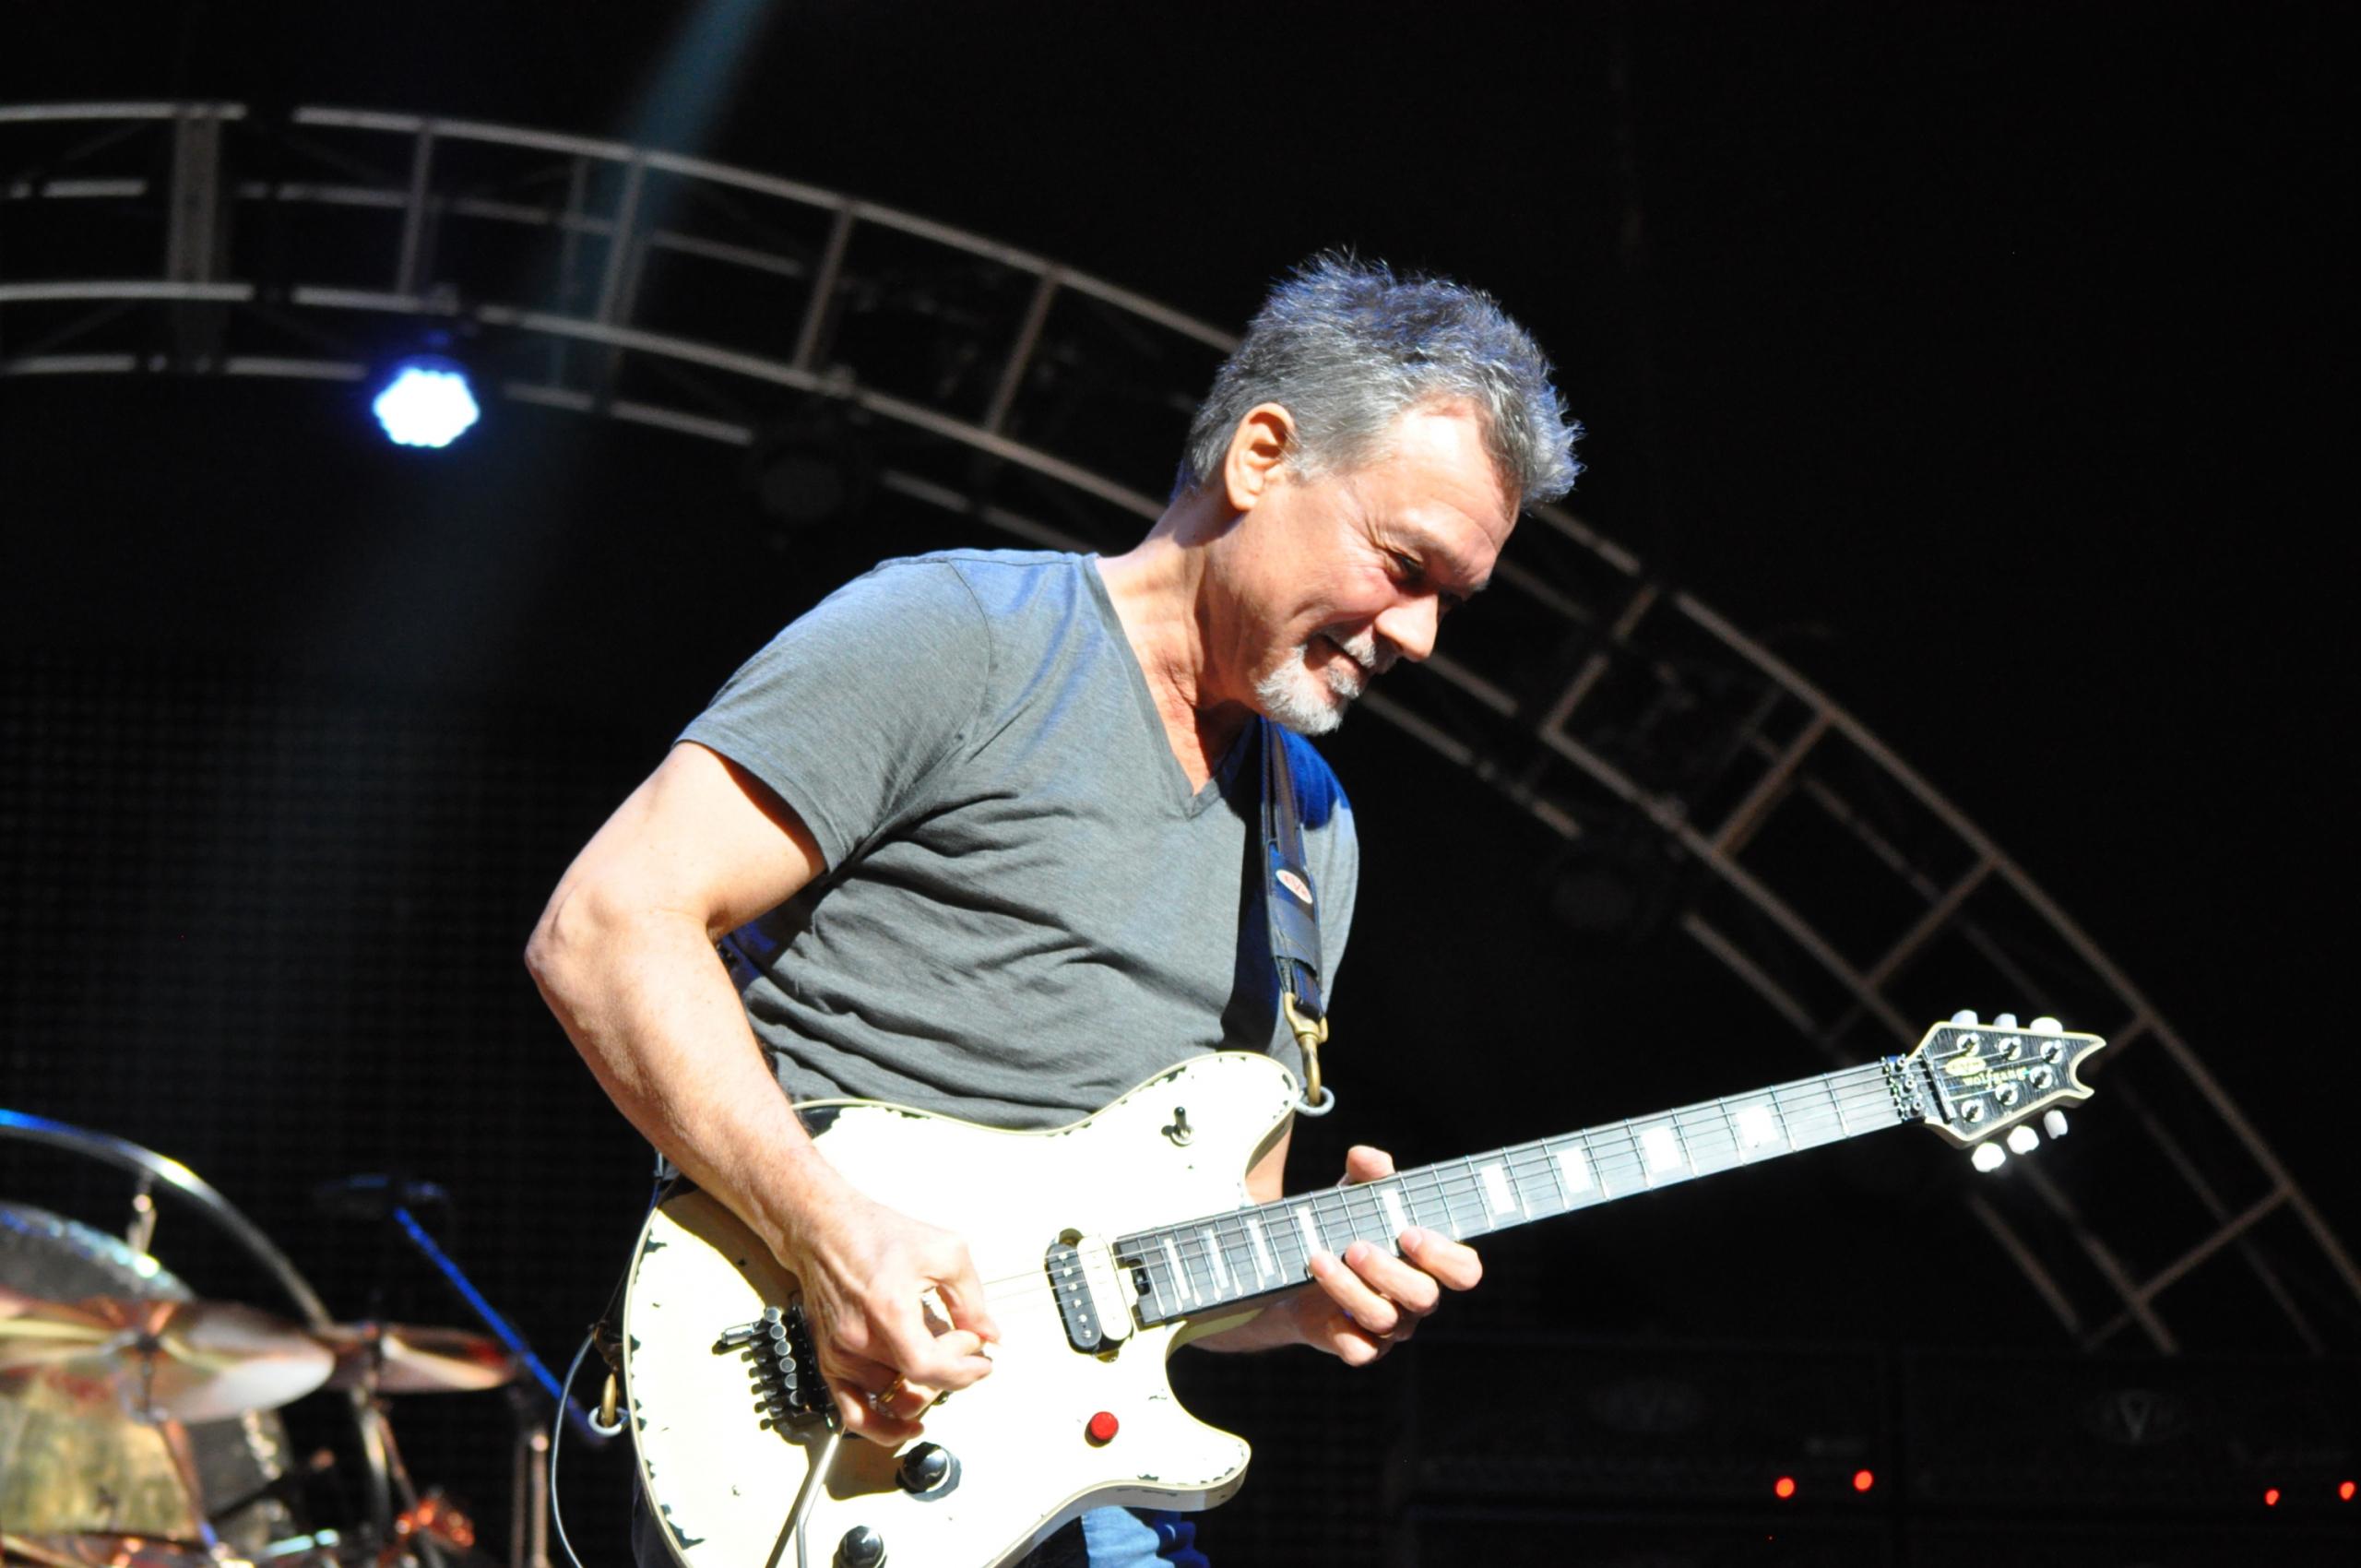 PODCAST – Wednesday, October 6: Remembering Eddie Van Halen; The World's Worst Wedgie; Reviewing The Sopranos Prequel